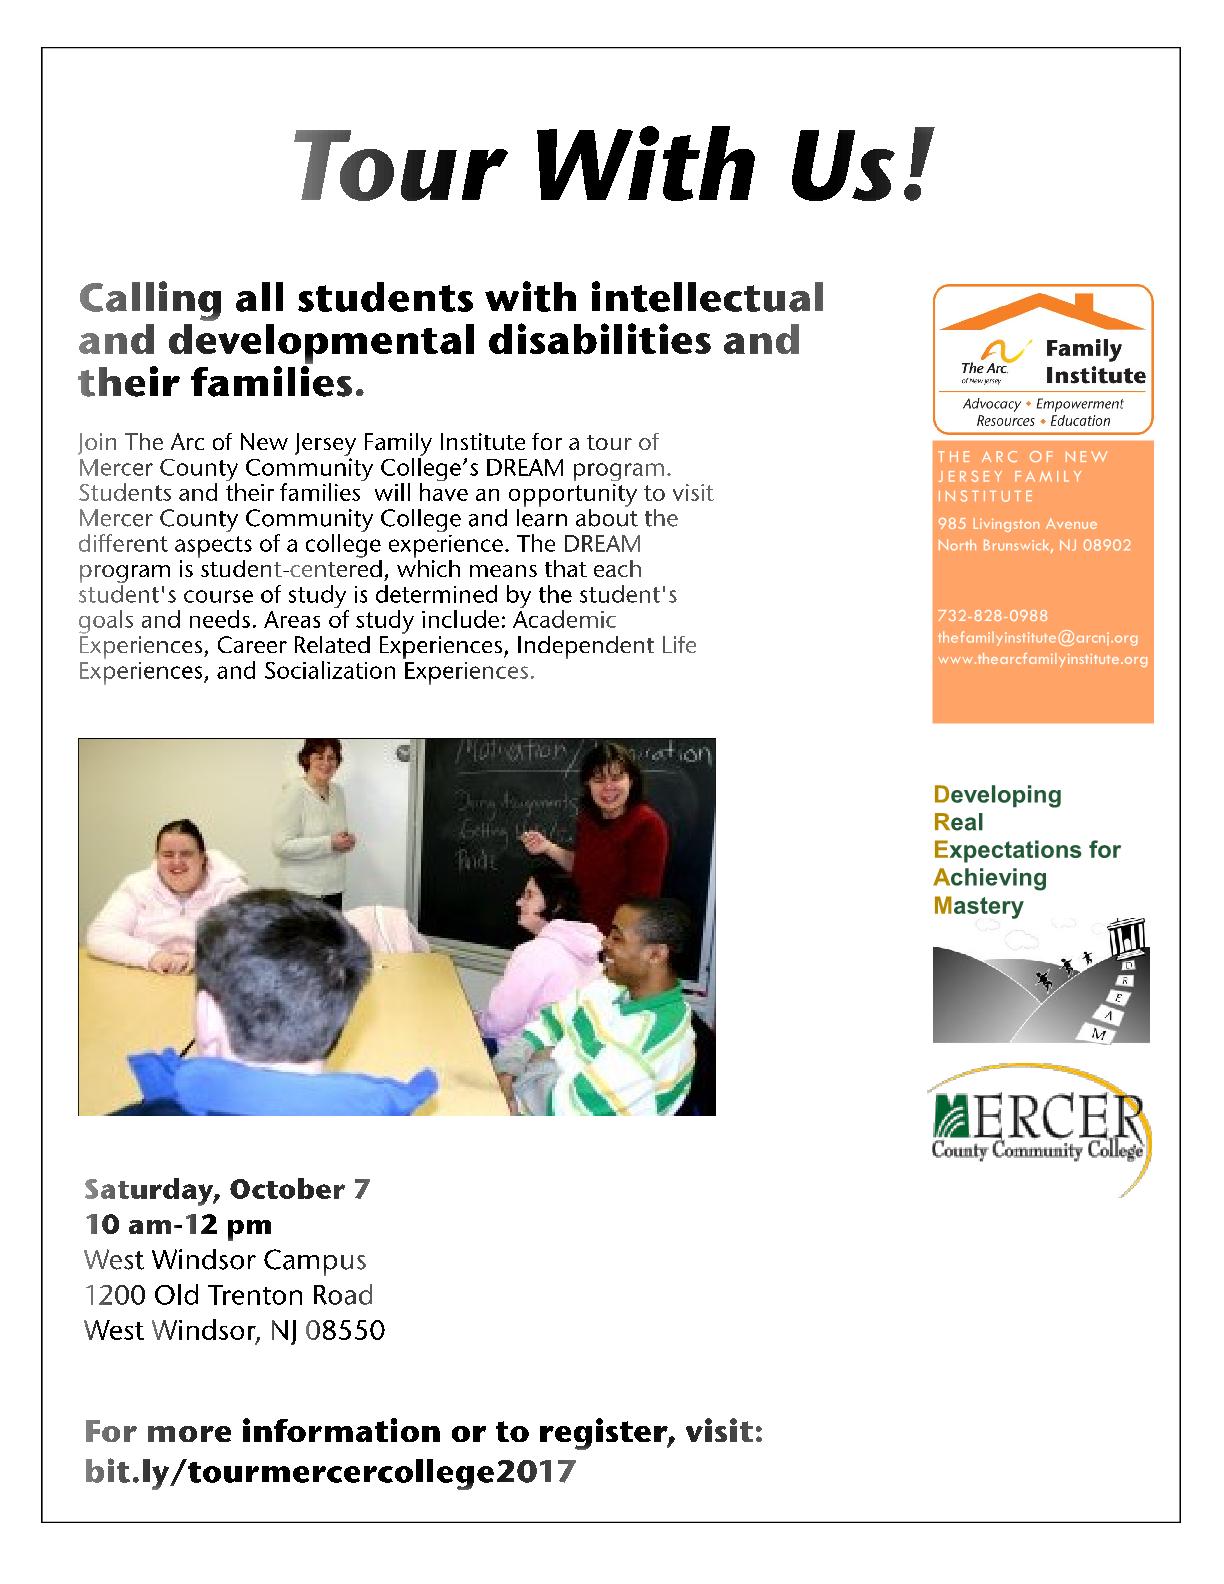 Mercer County Community College's DREAM program